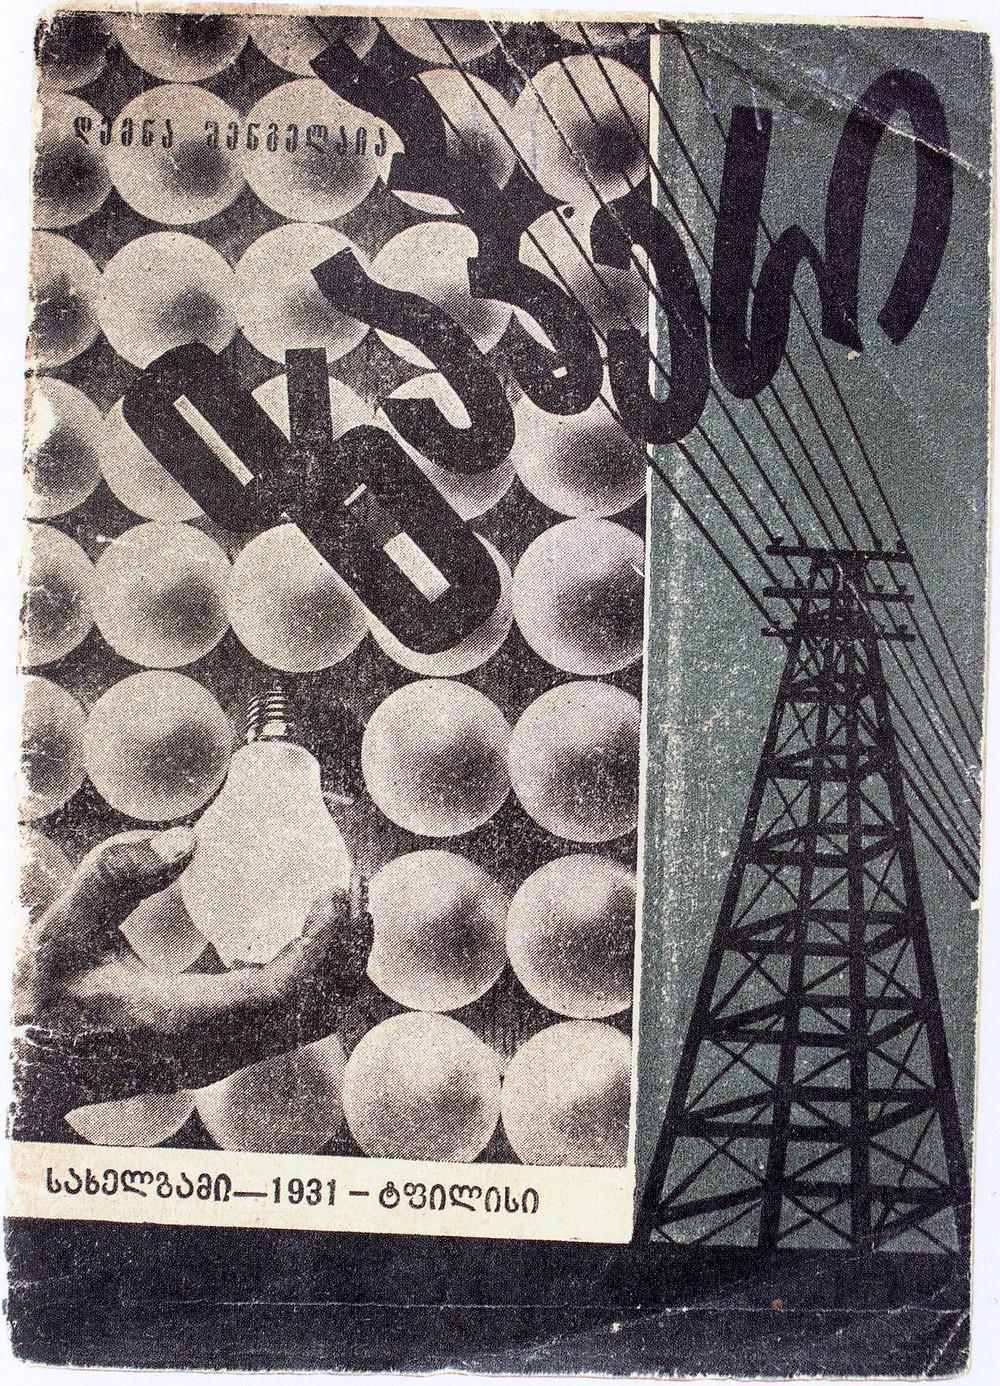 Cover montage by Irakli Gamrekeli, 1931.